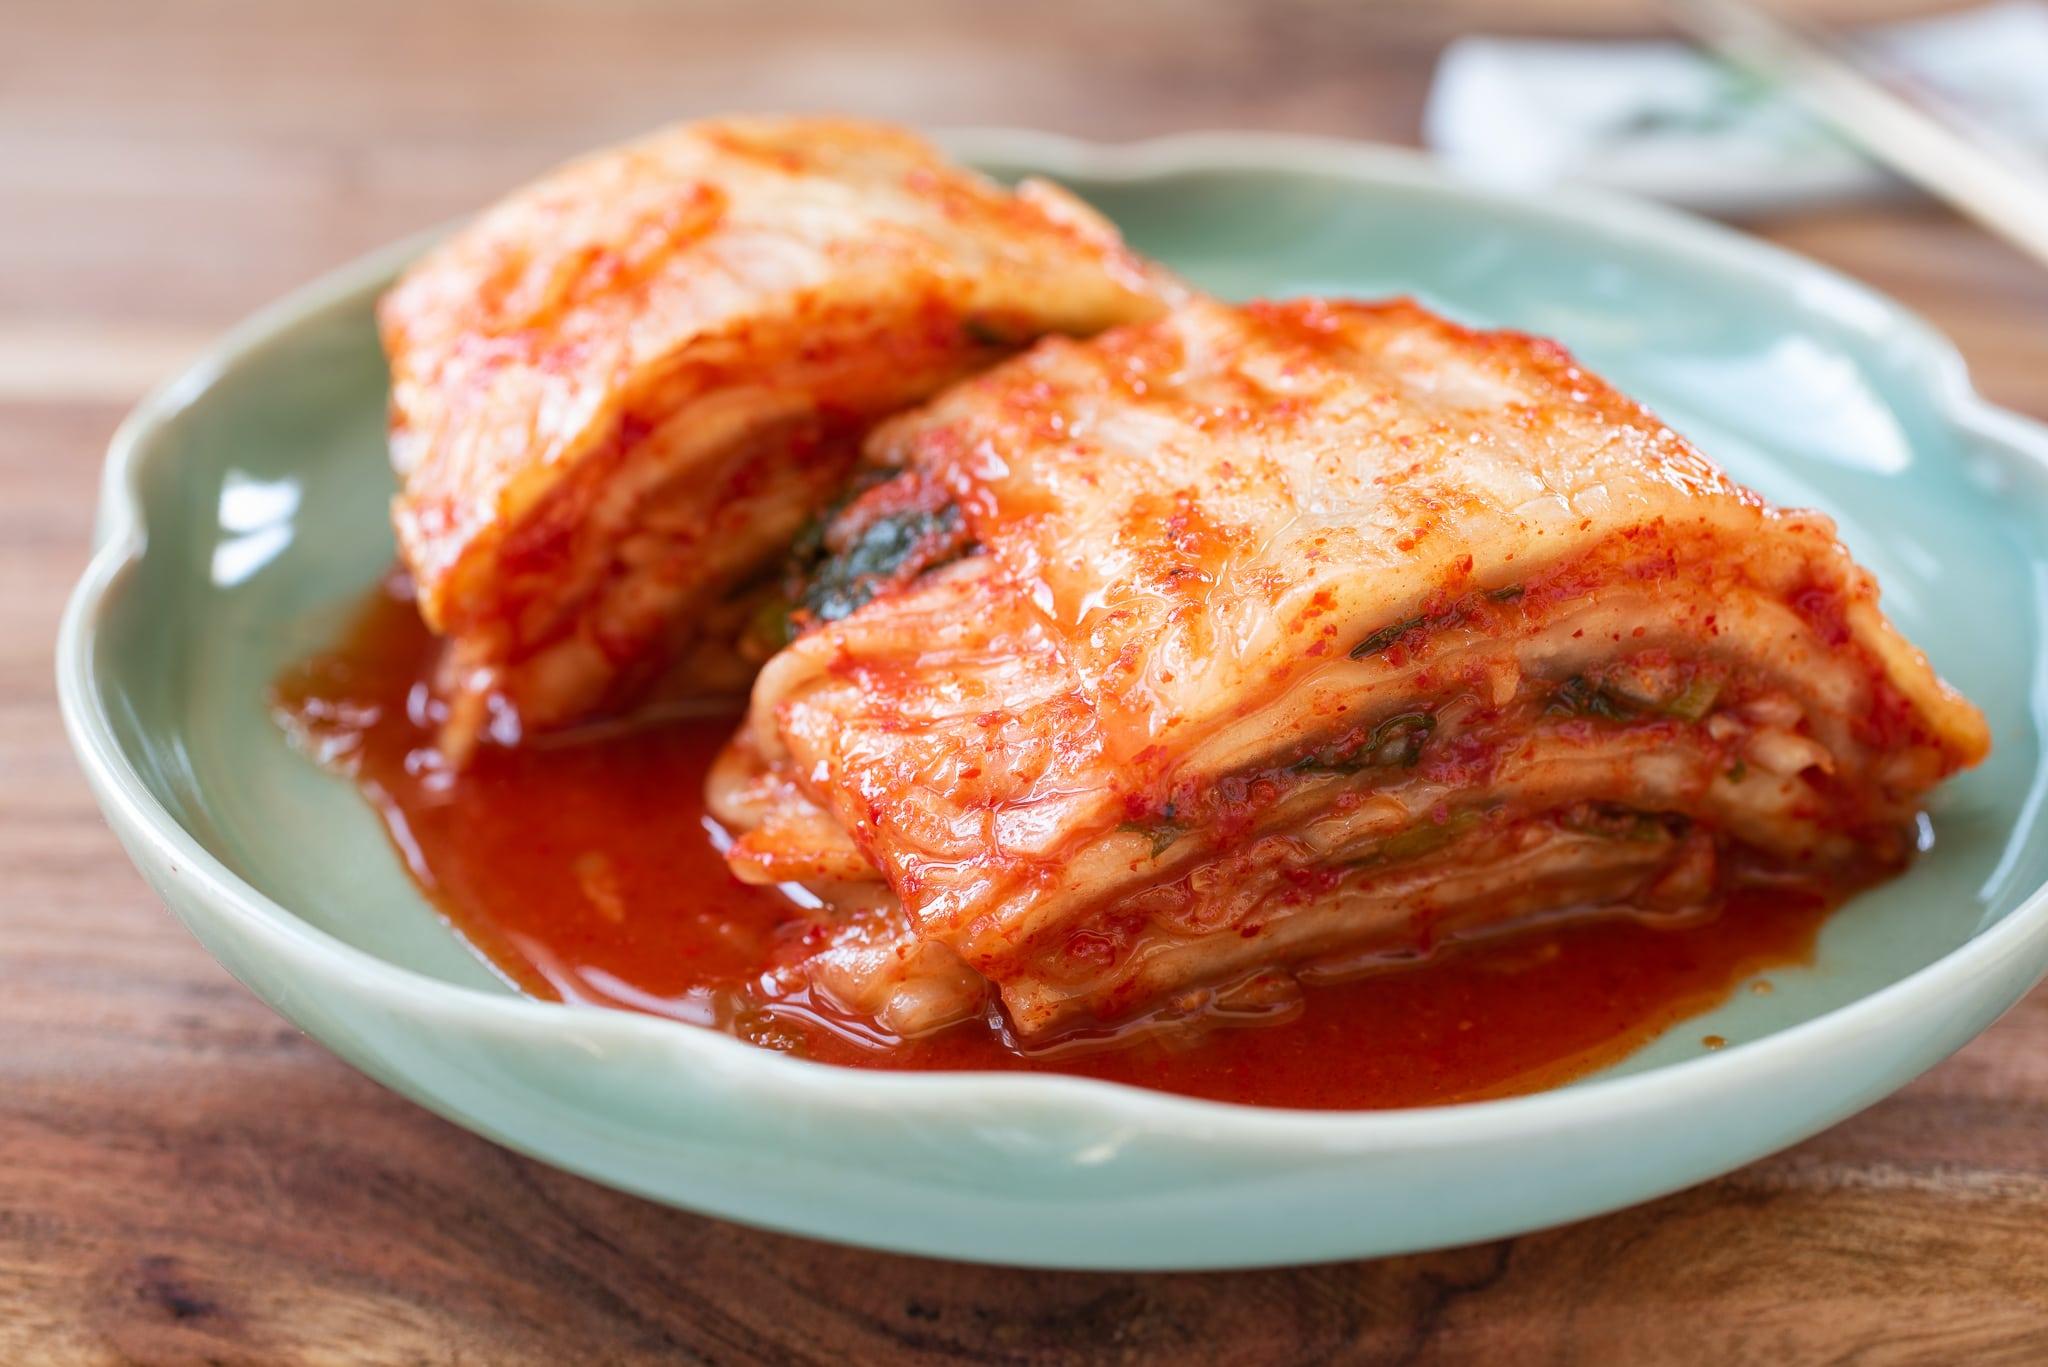 DSC6782 4 1 - Traditional Kimchi (Napa Cabbage Kimchi)